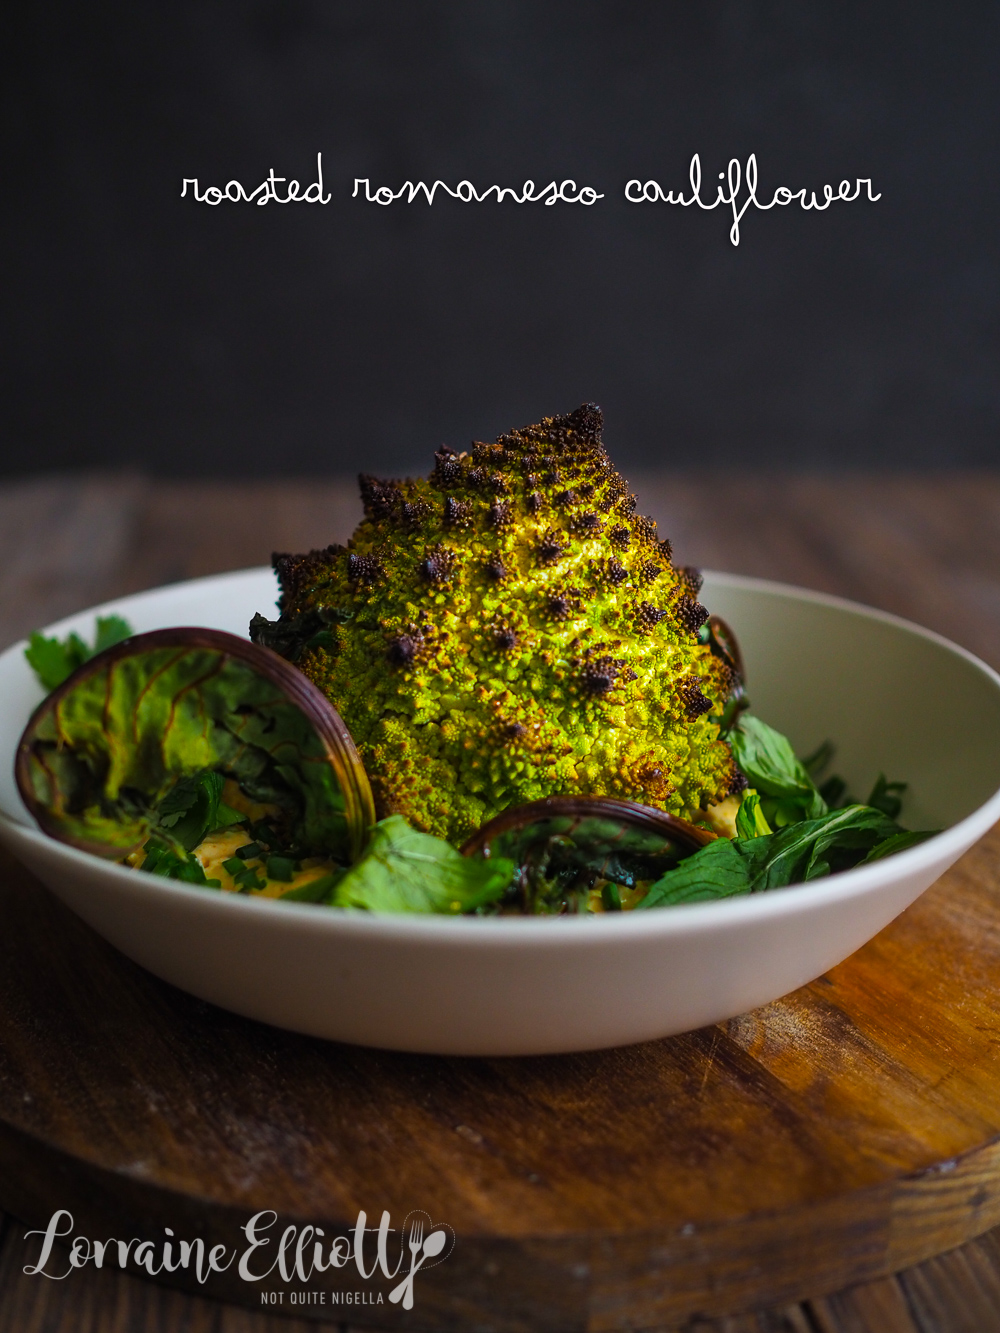 Whole Roasted Romanesco Cauliflower Broccoli